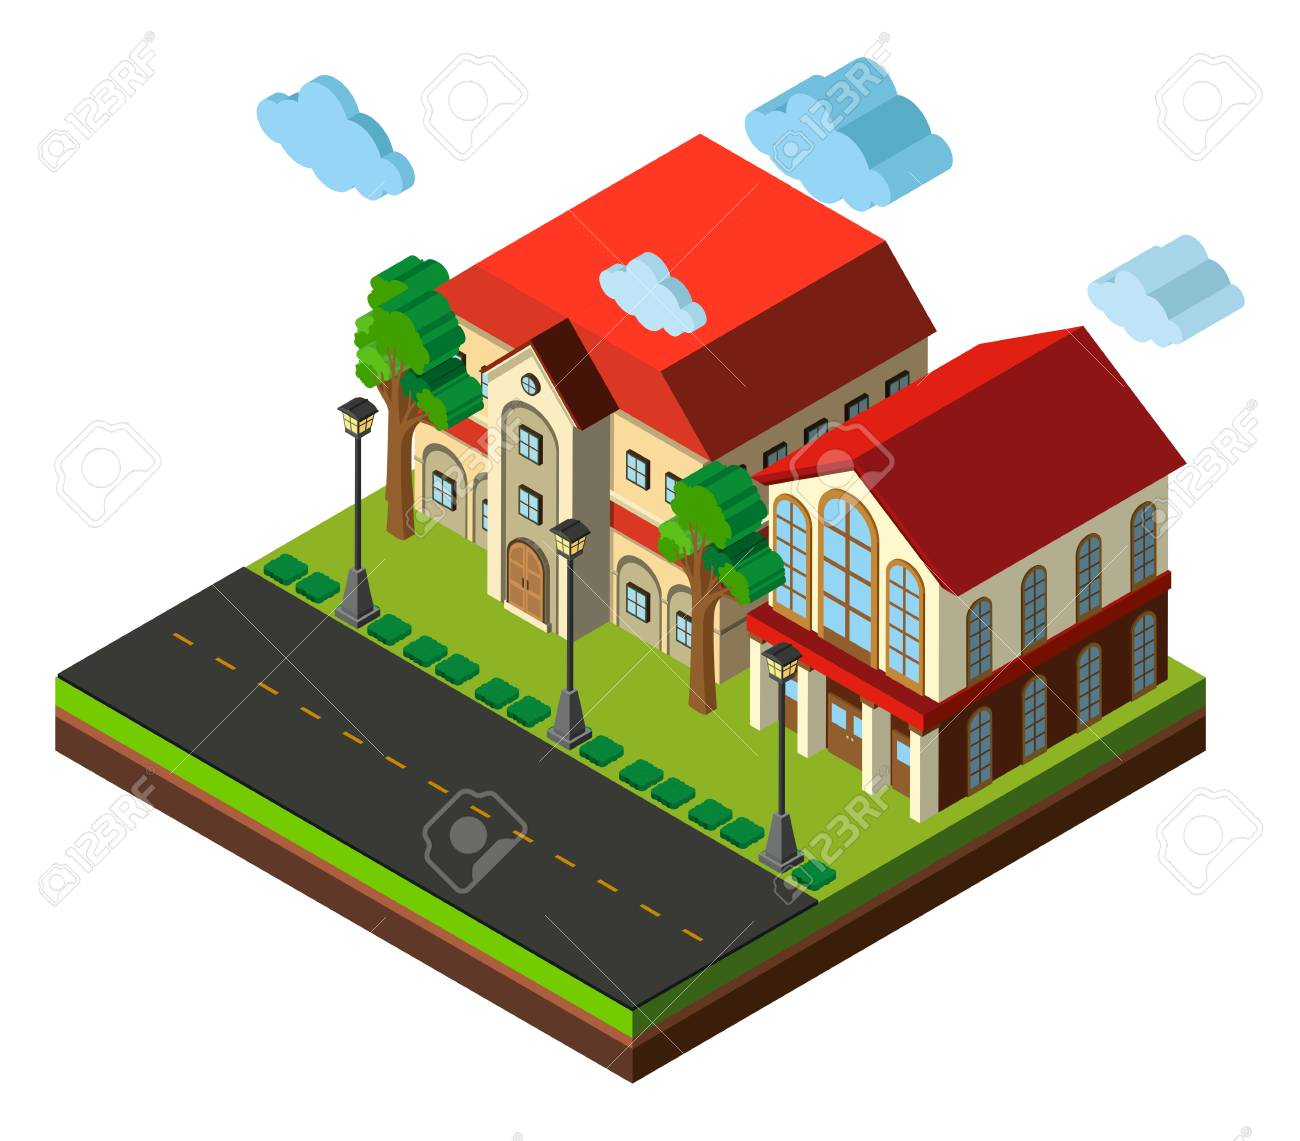 Free Home Designer Cliparts, Download Free Clip Art, Free Clip Art on  Clipart Library